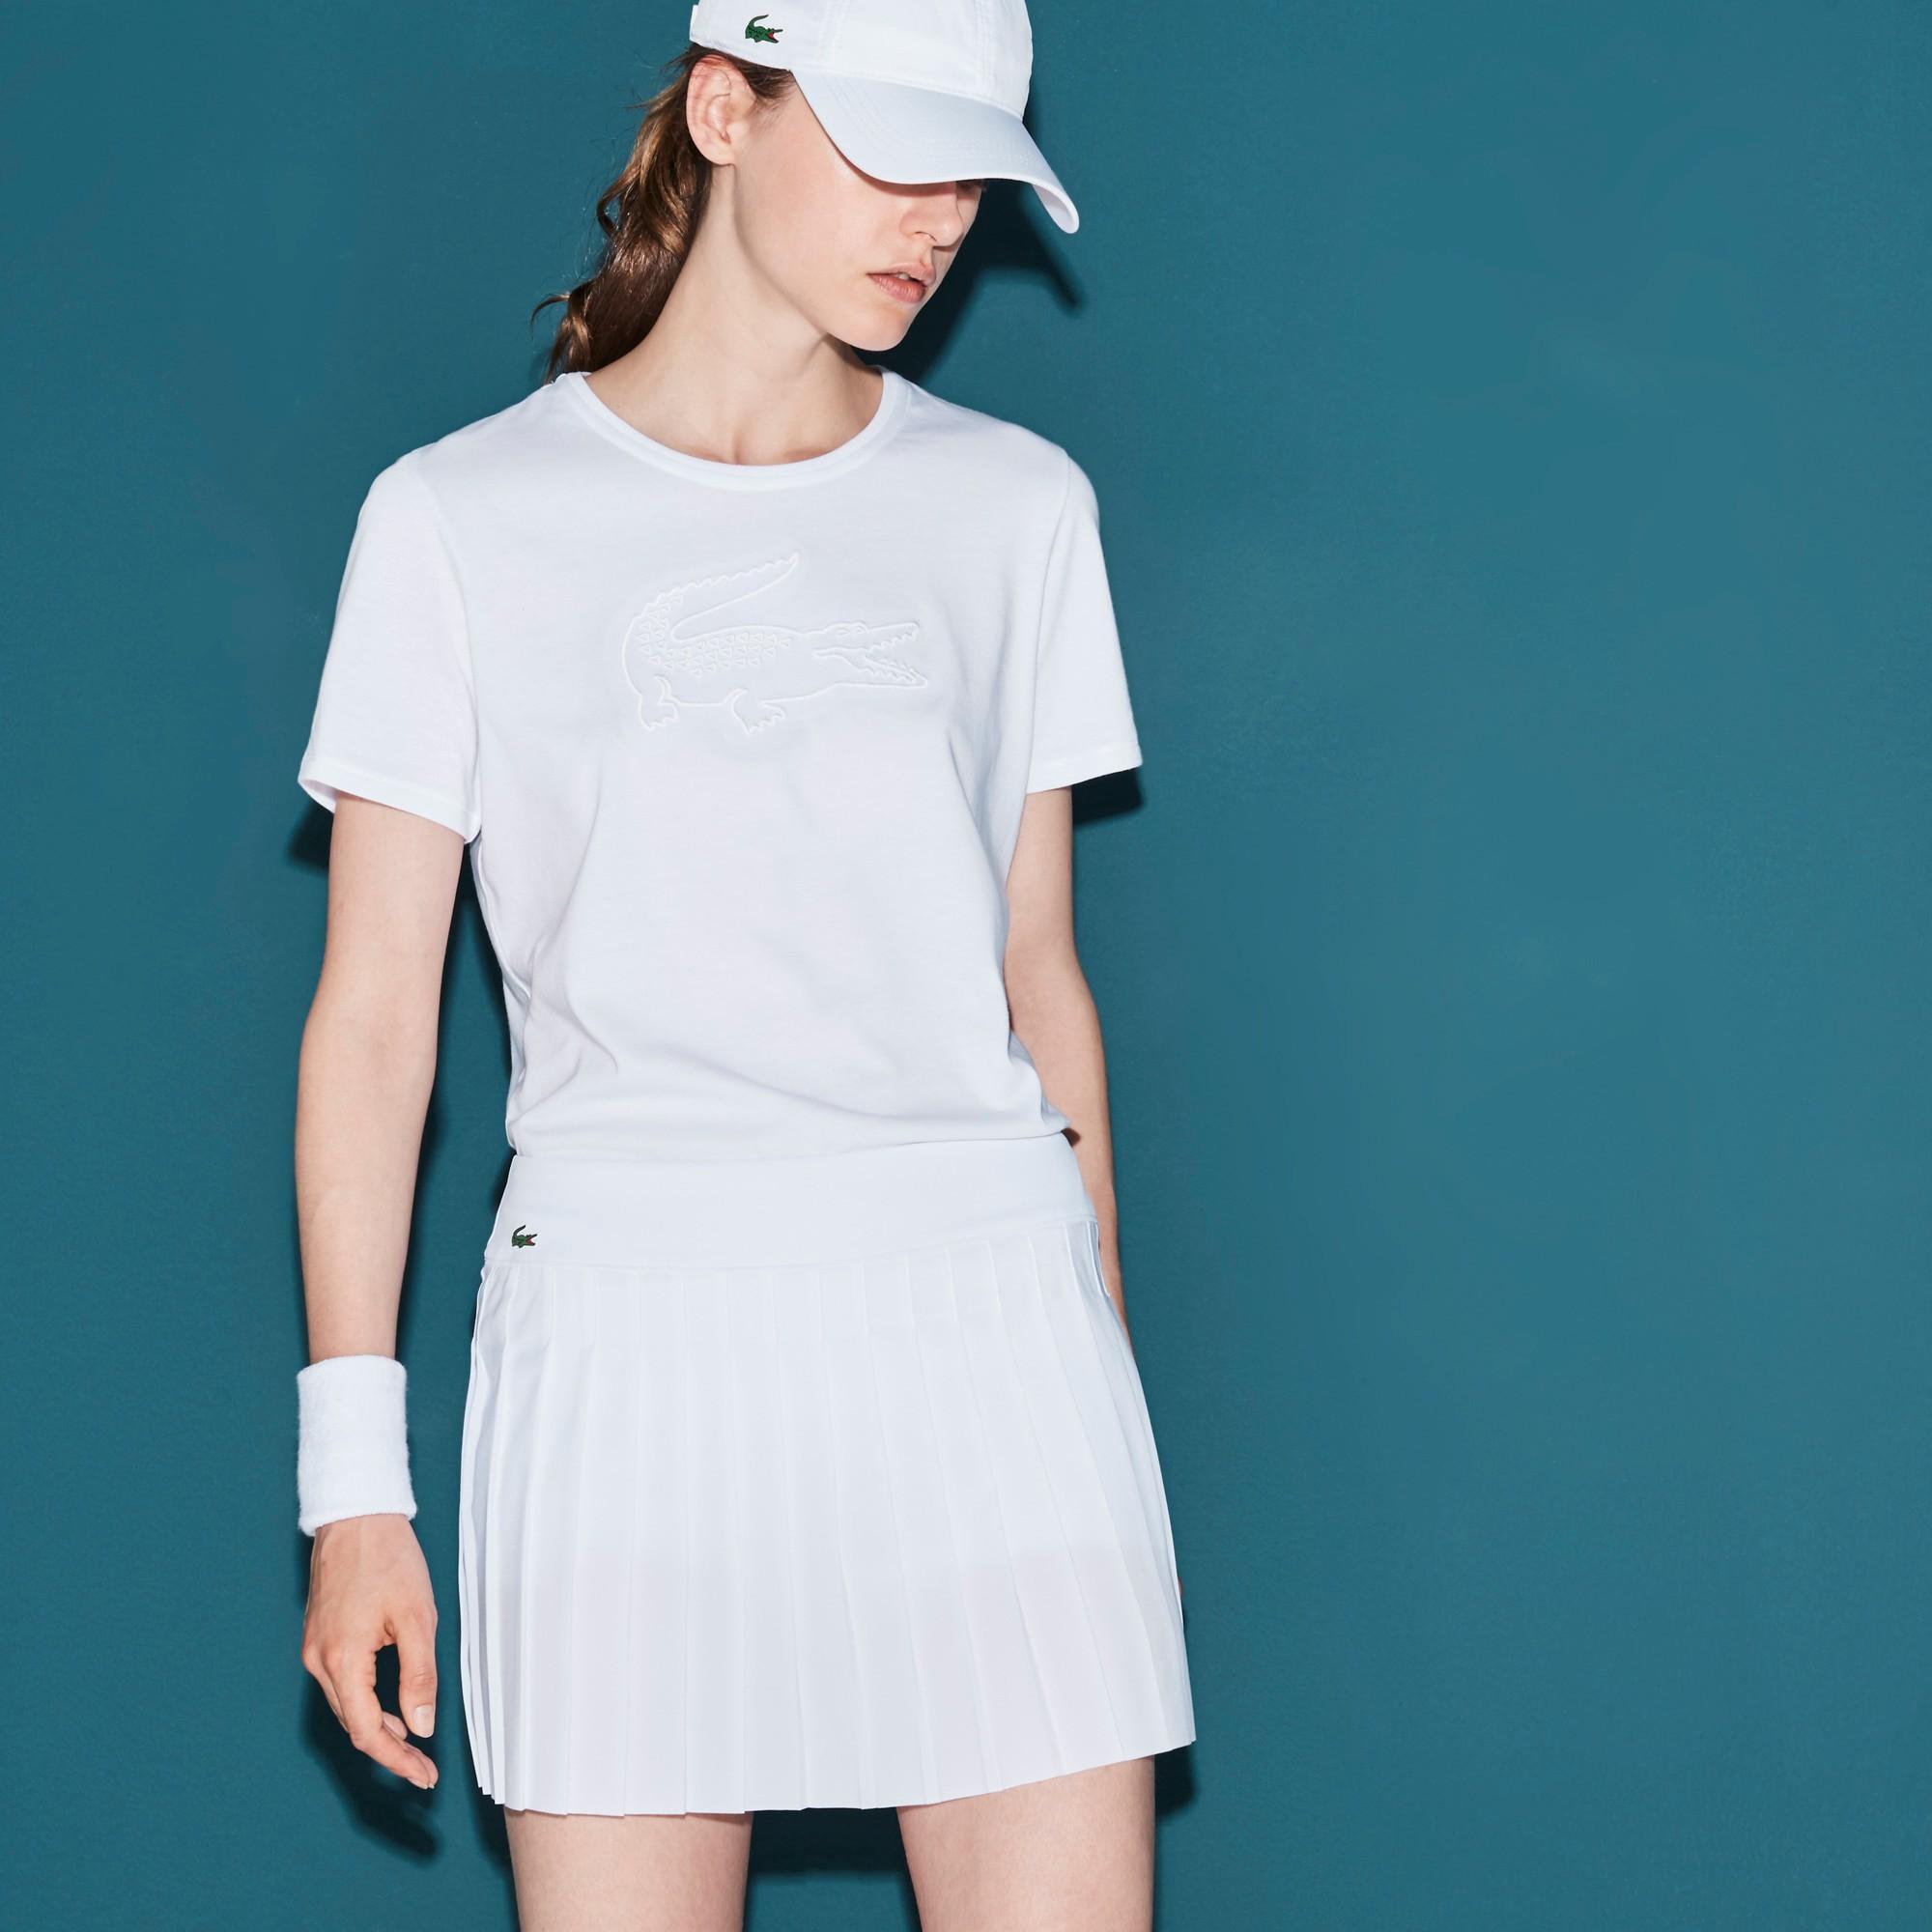 bd0f8641b4 Women's Lacoste Sport Tennis Croc Embroidery Tech Jersey T-Shirt -  White/White